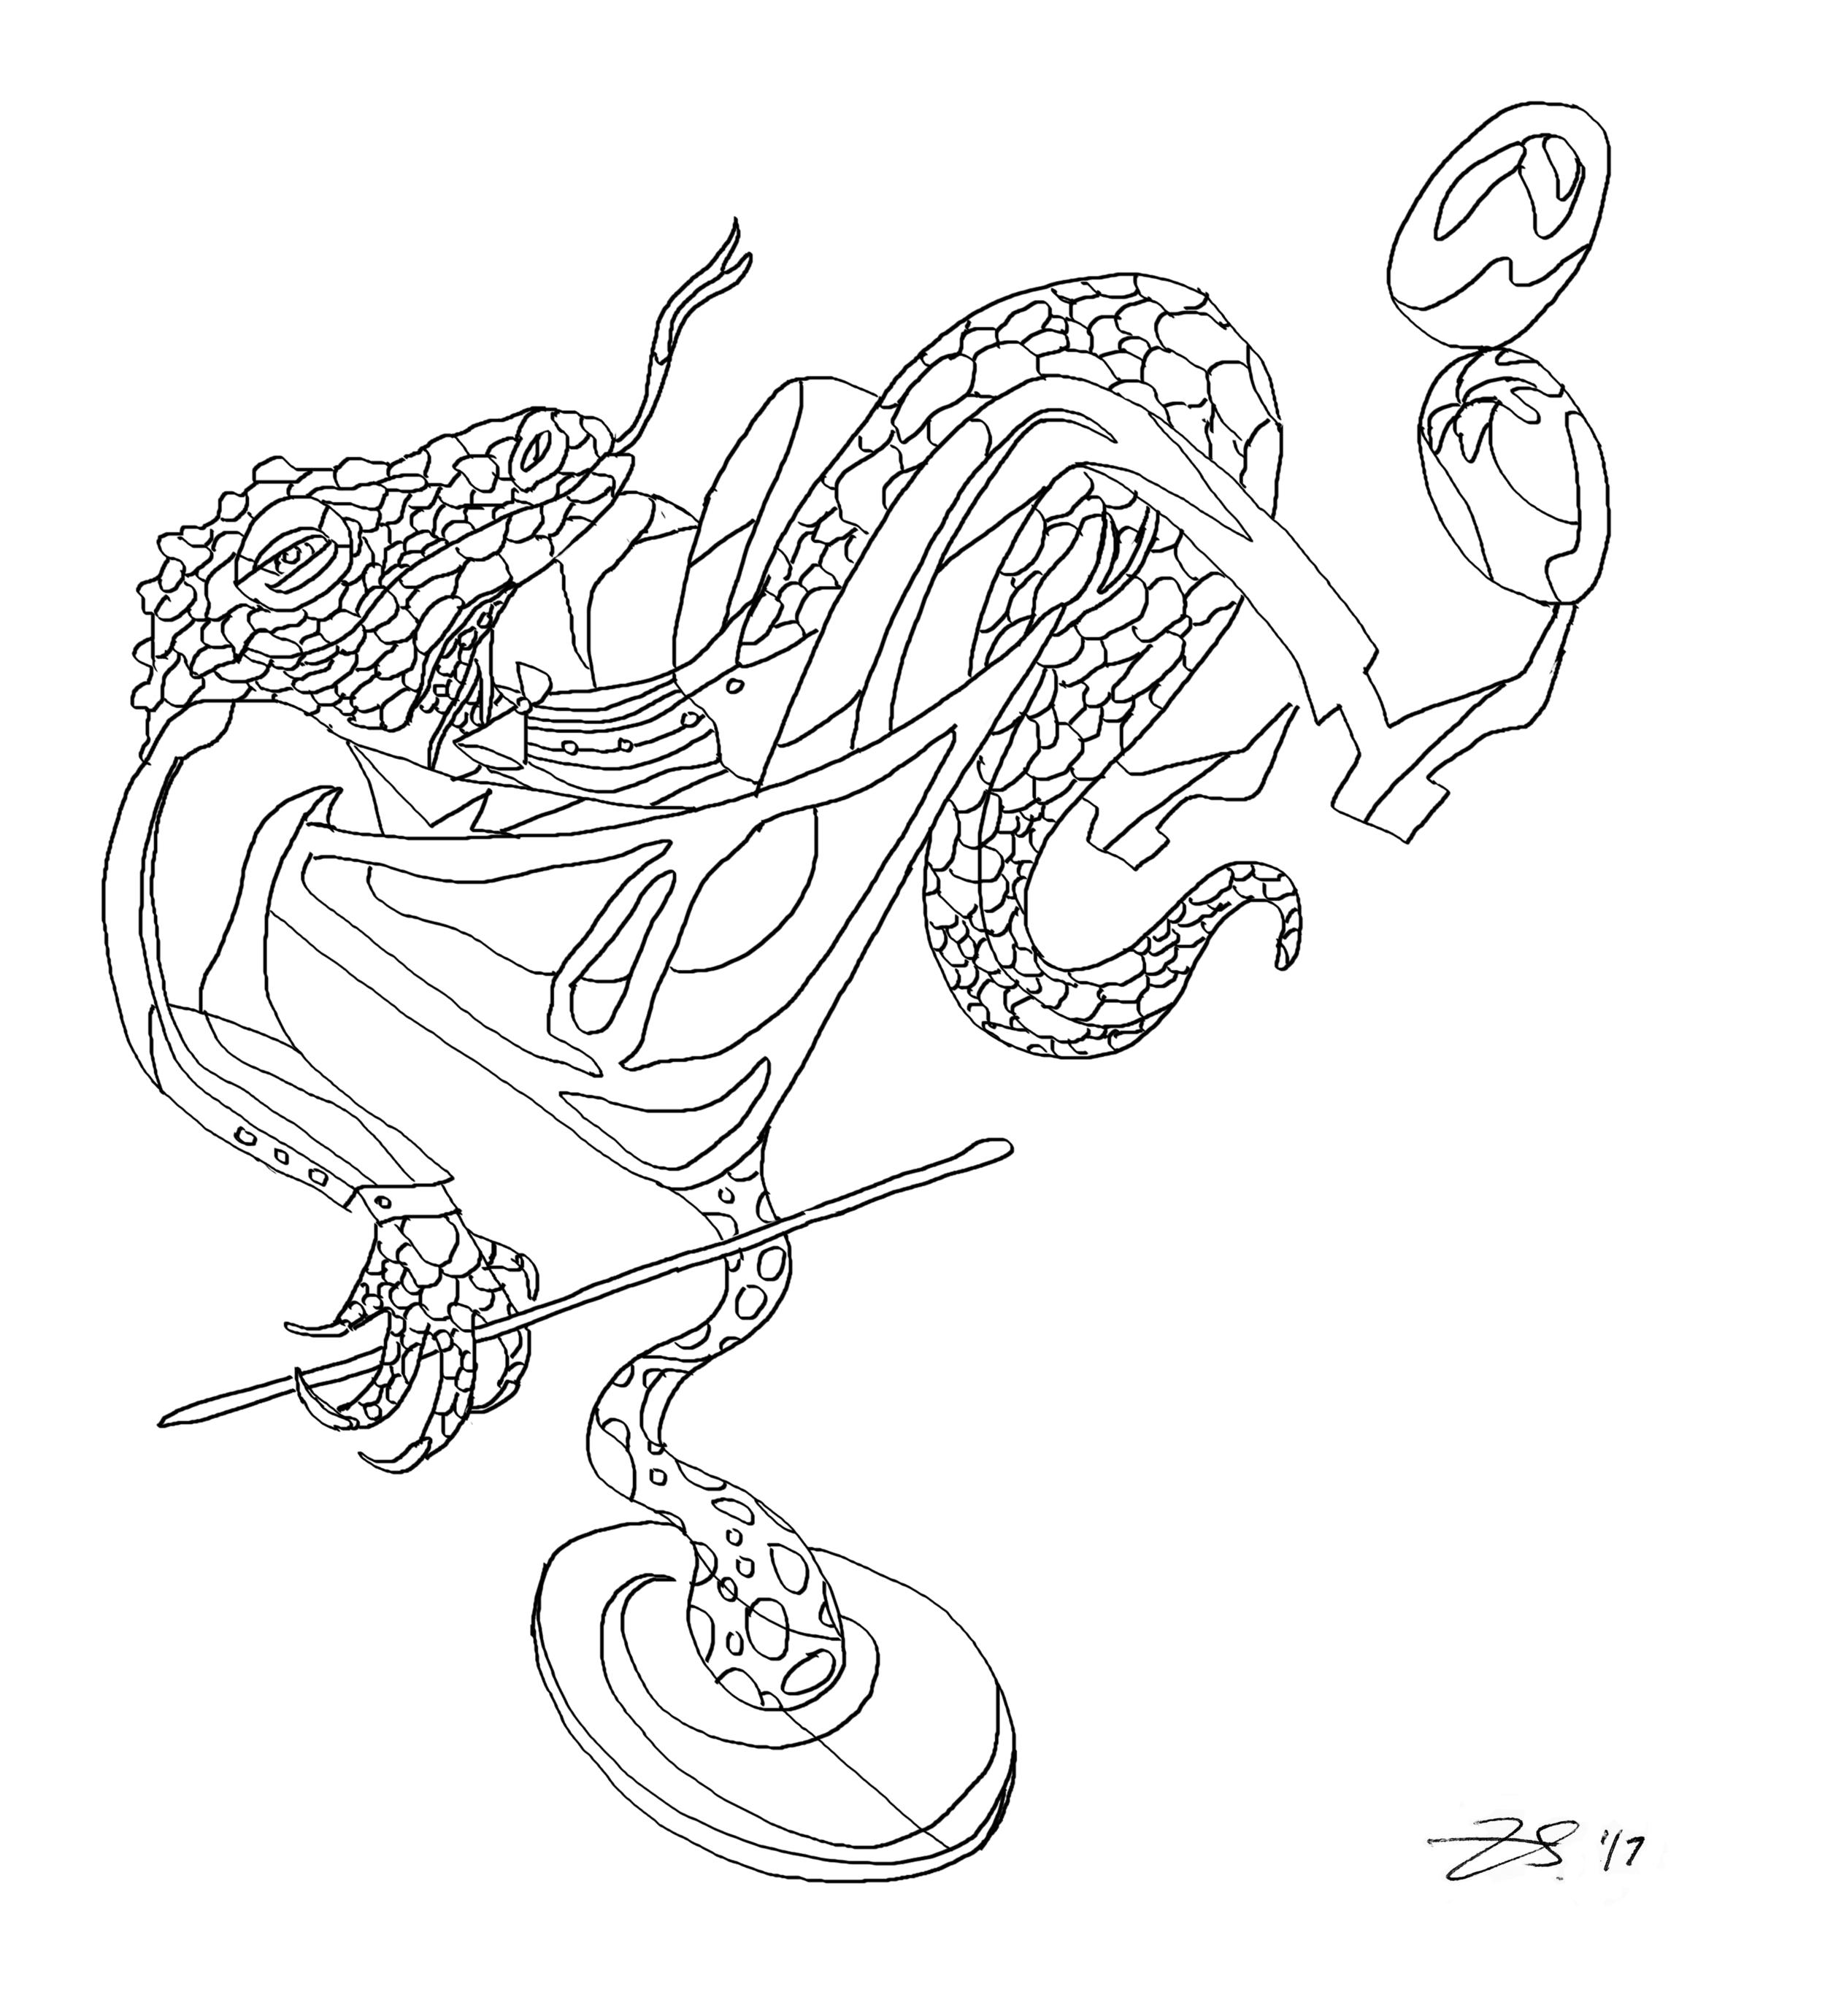 Lounge Lizard (sketch)